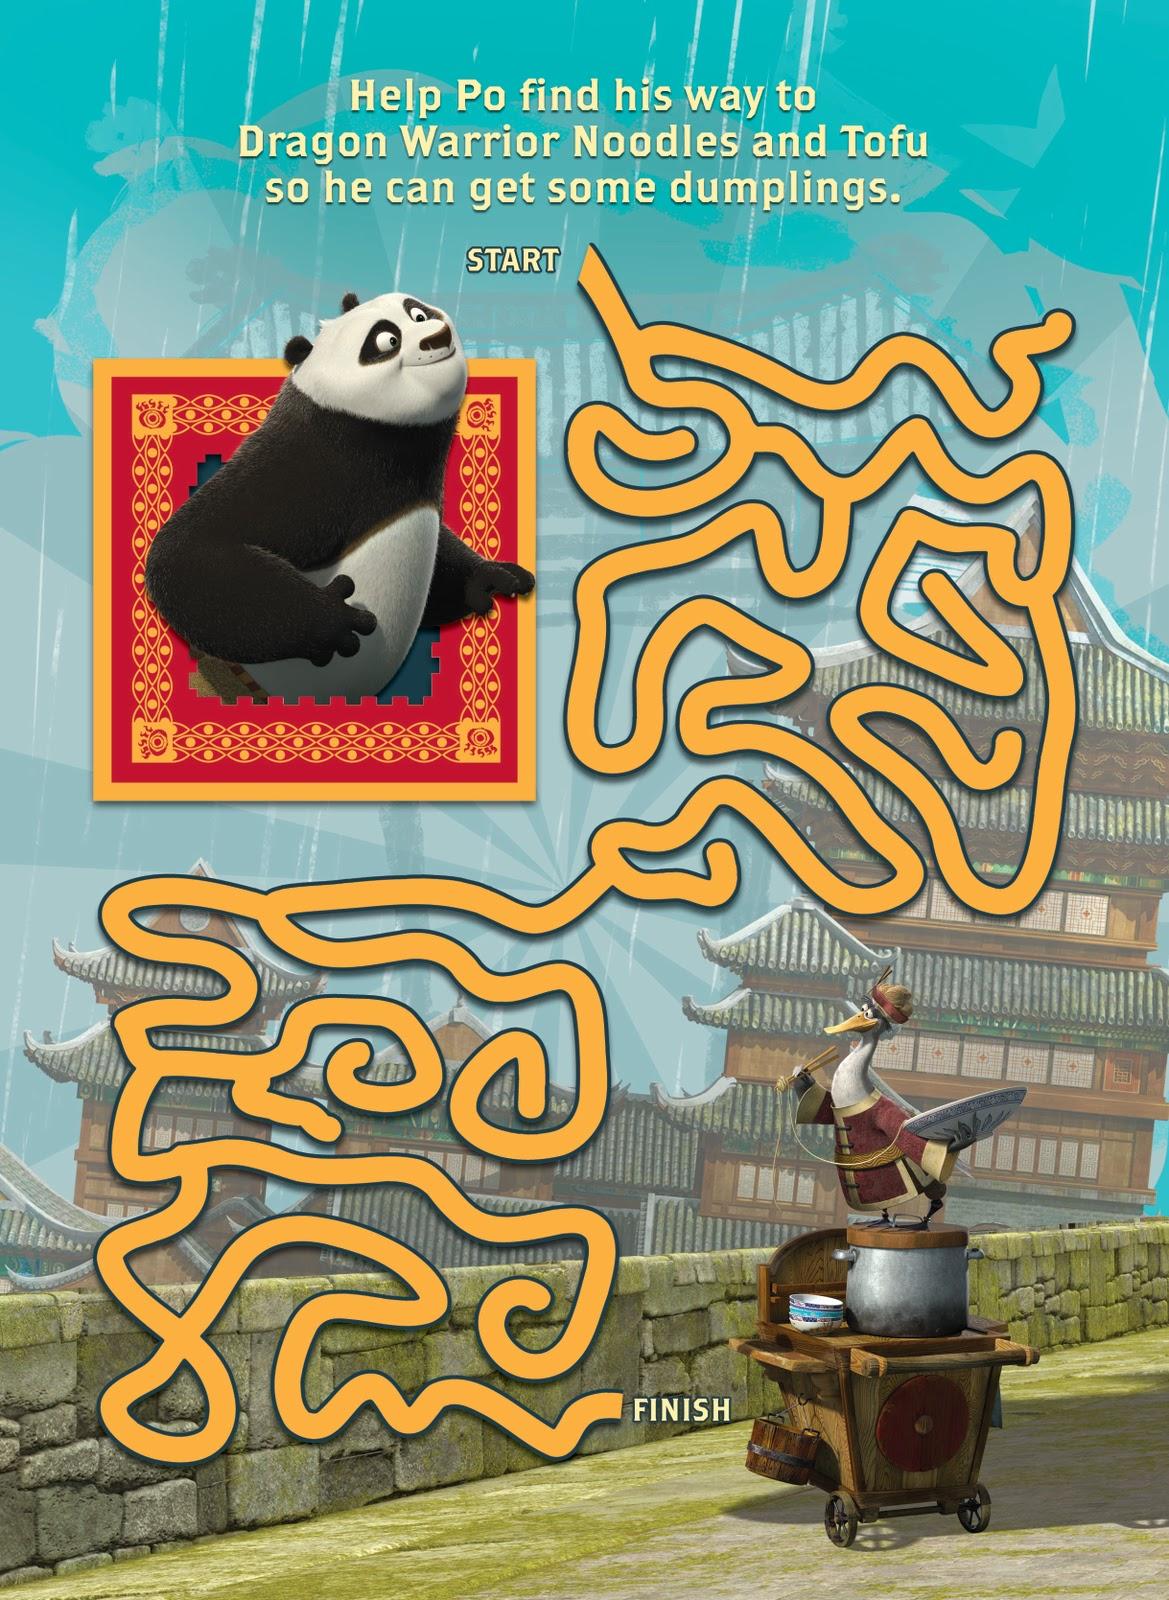 Zelda phantom hourglass maze island prizes for ugly sweater